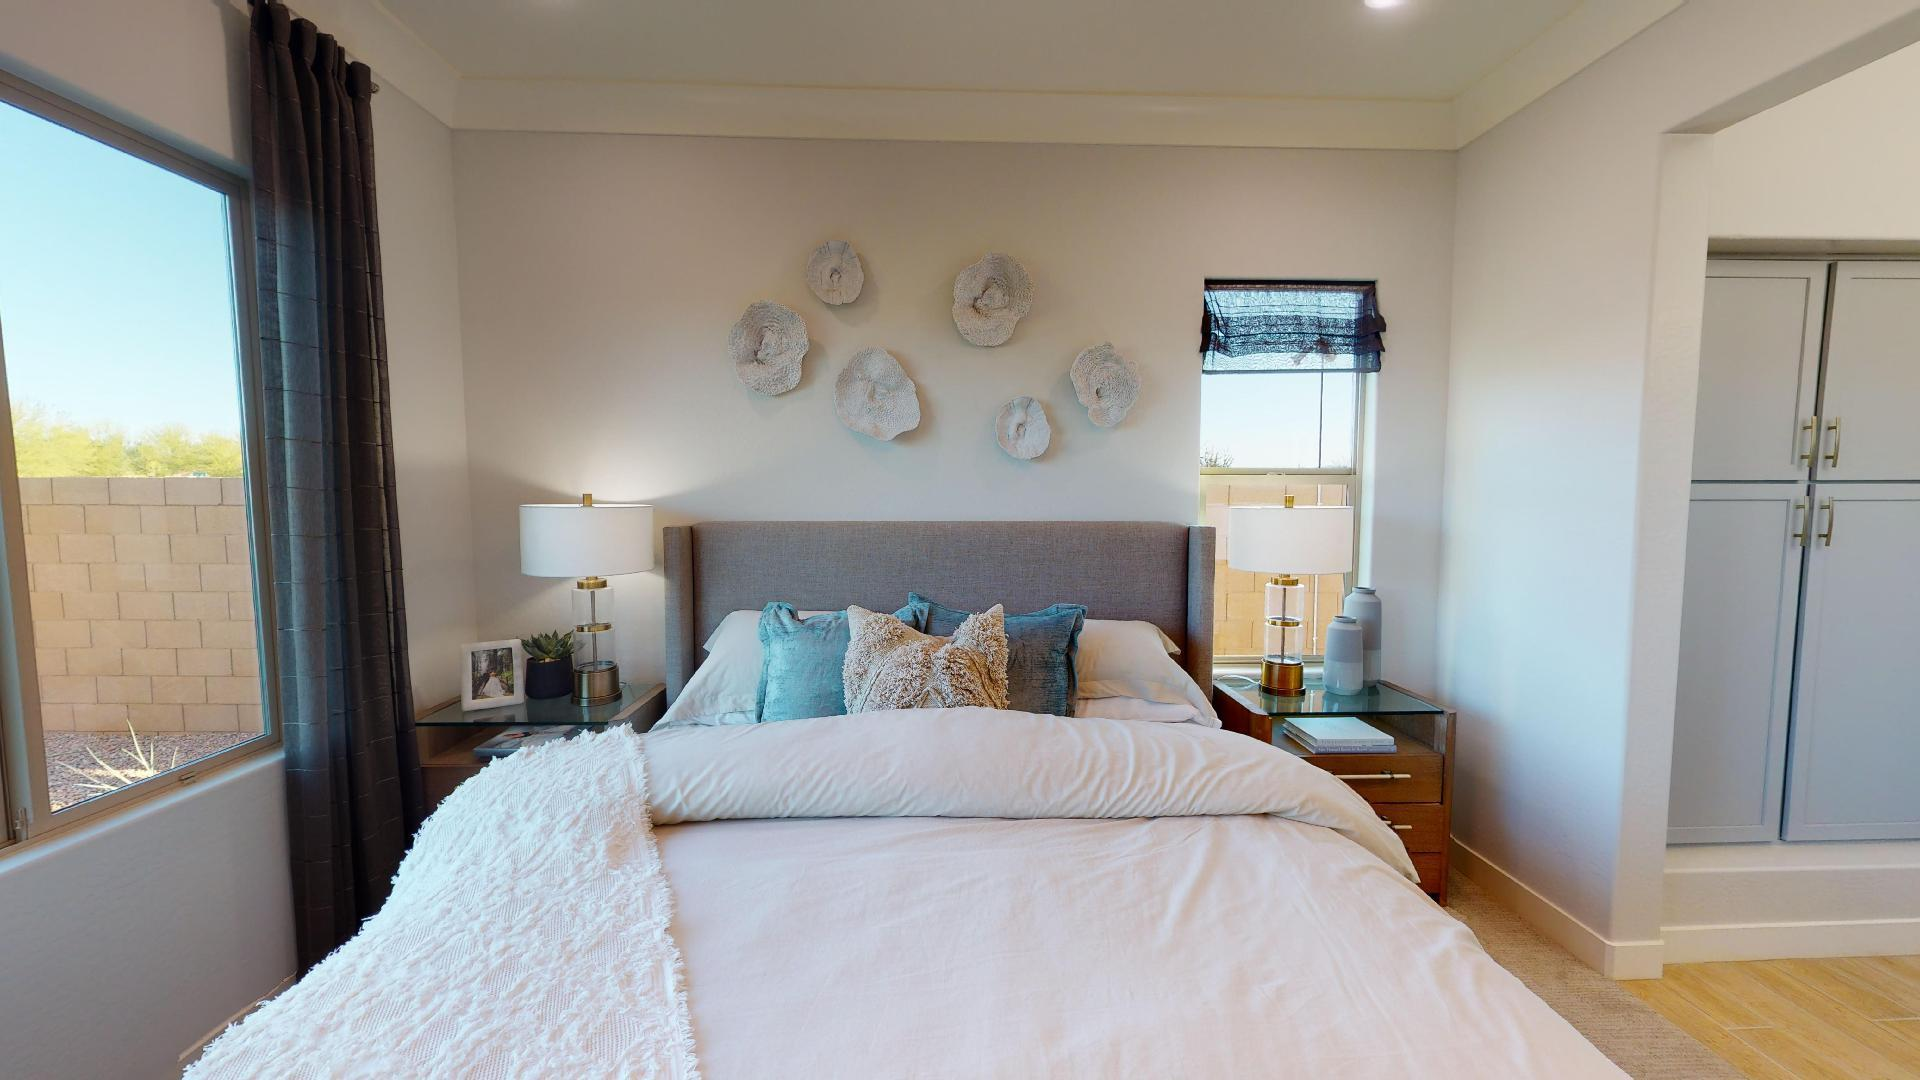 Bedroom featured in the Brookside By Cresleigh Homes Arizona, Inc. in Phoenix-Mesa, AZ